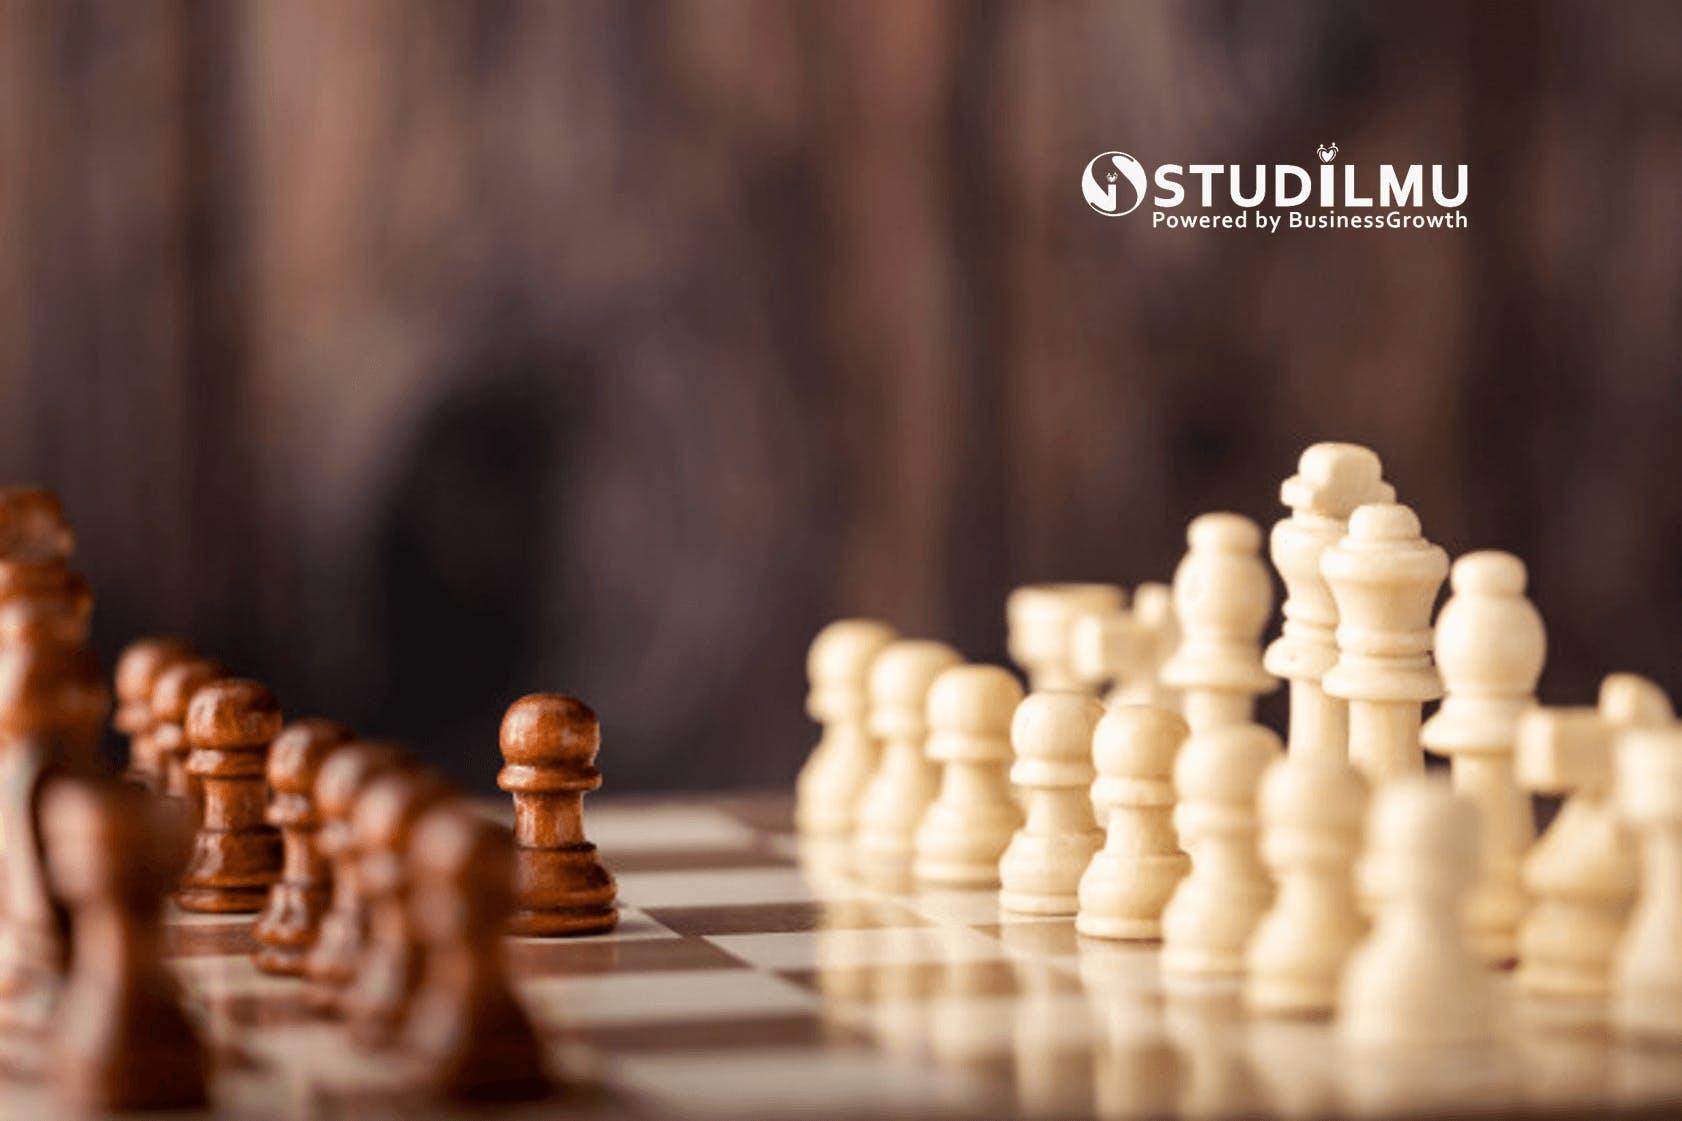 STUDILMU Career Advice - 10 Cara untuk Mulai Mengasah Strategi Pemasaran